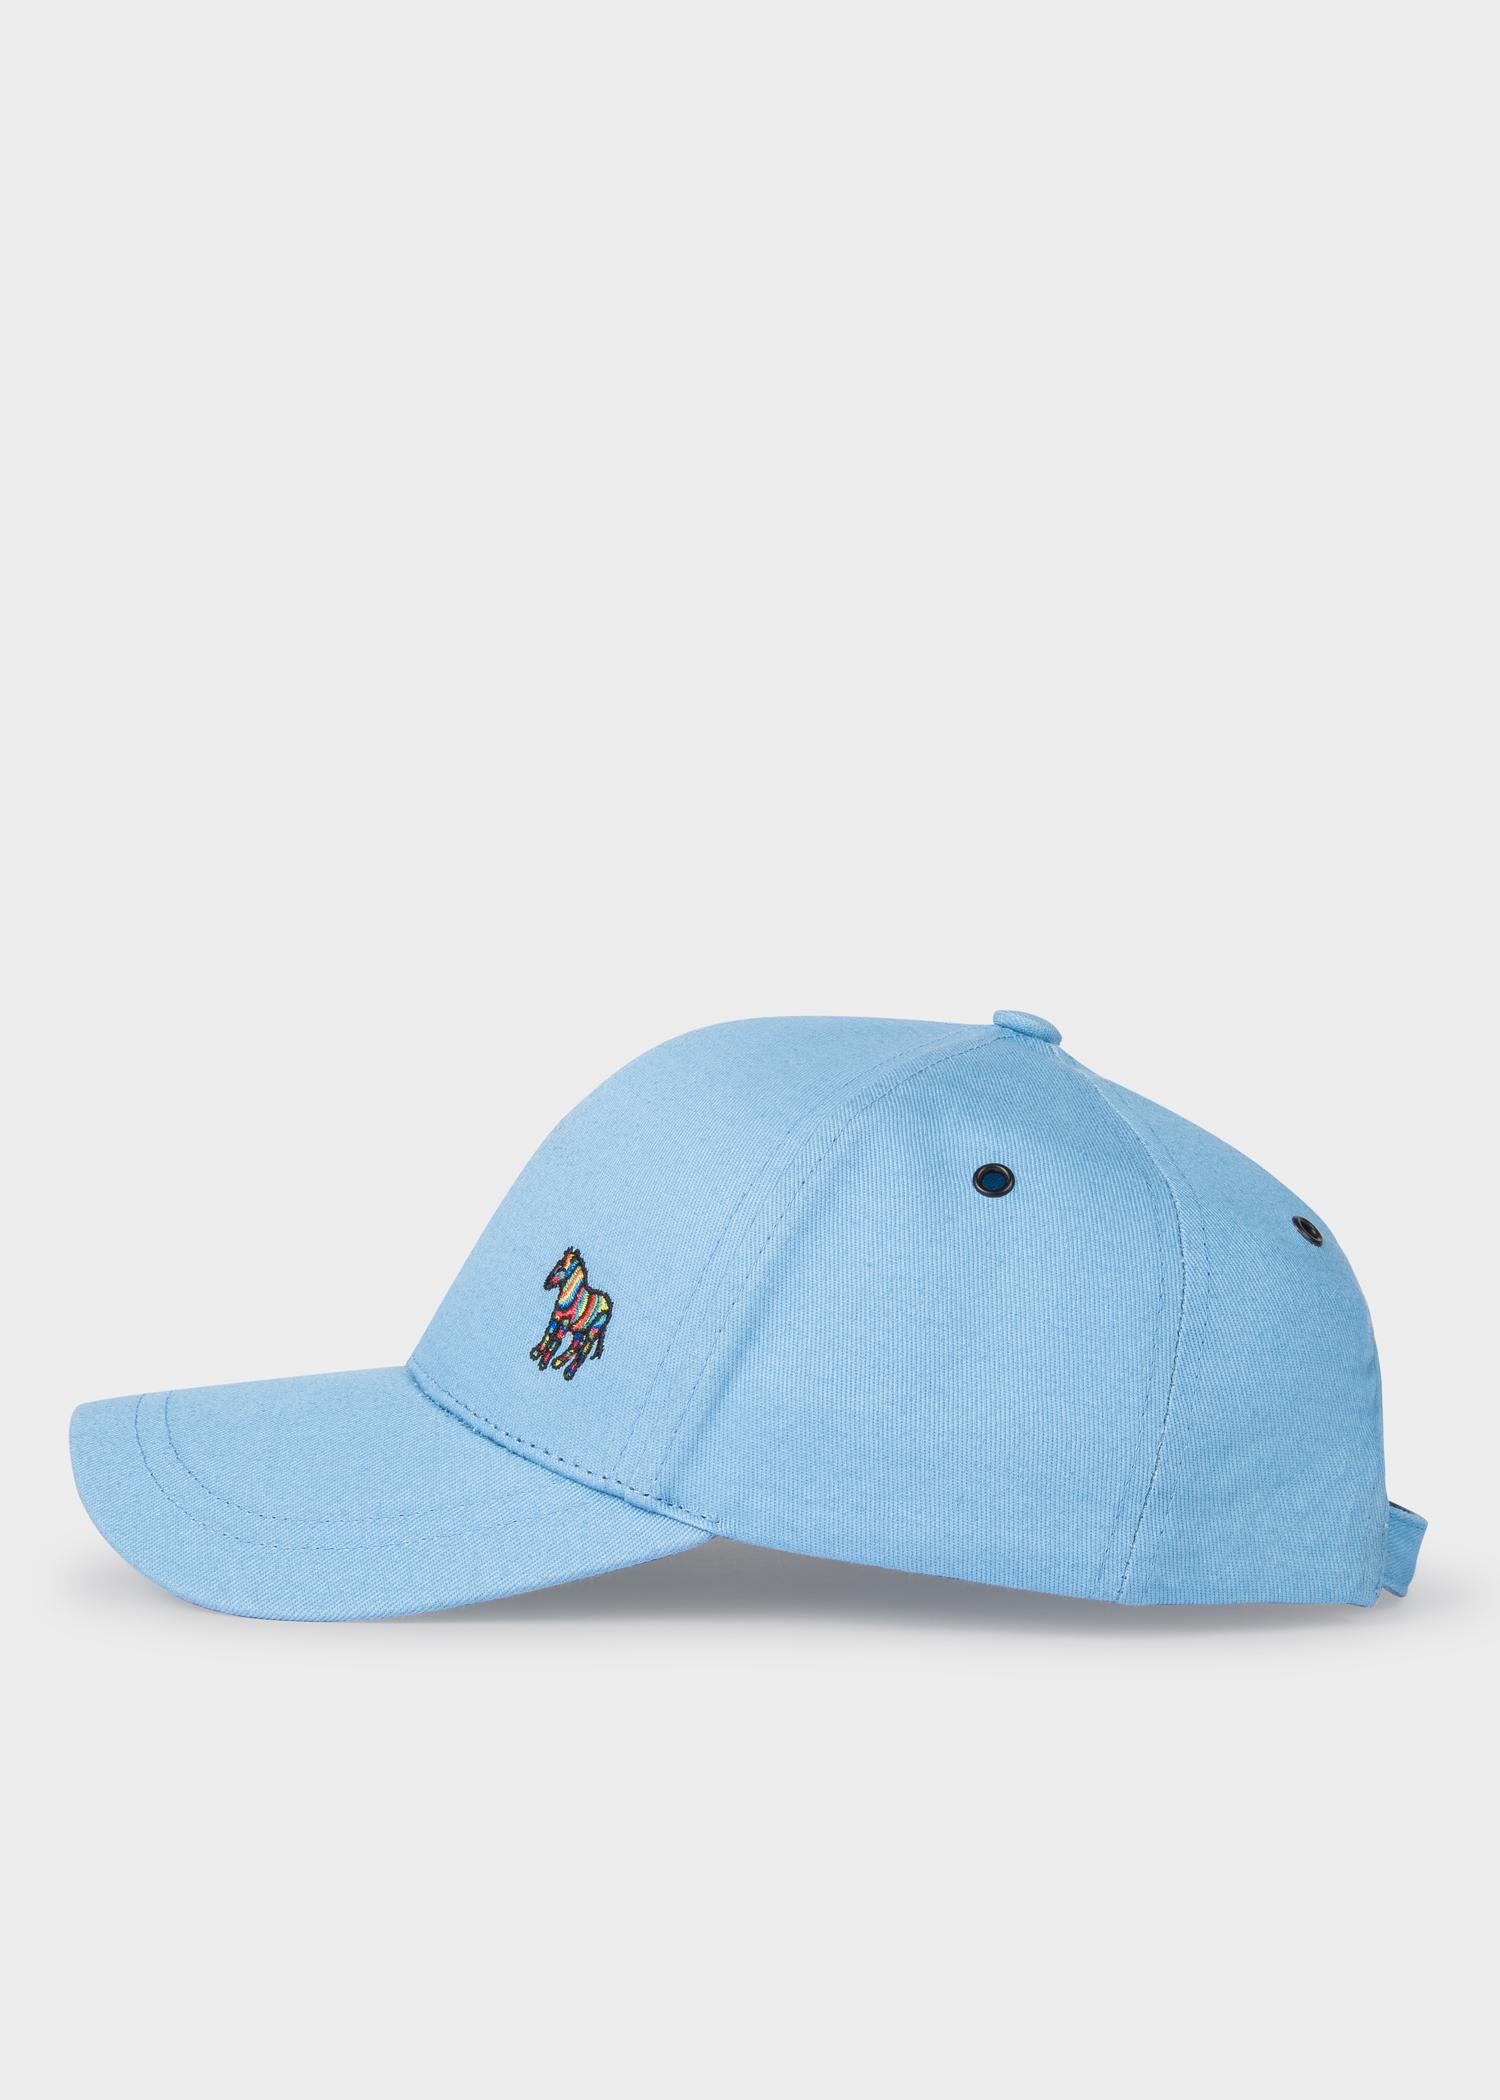 9e44acf32e629a Side View - Men's Sky Blue Cotton Zebra Logo Baseball Cap Paul Smith